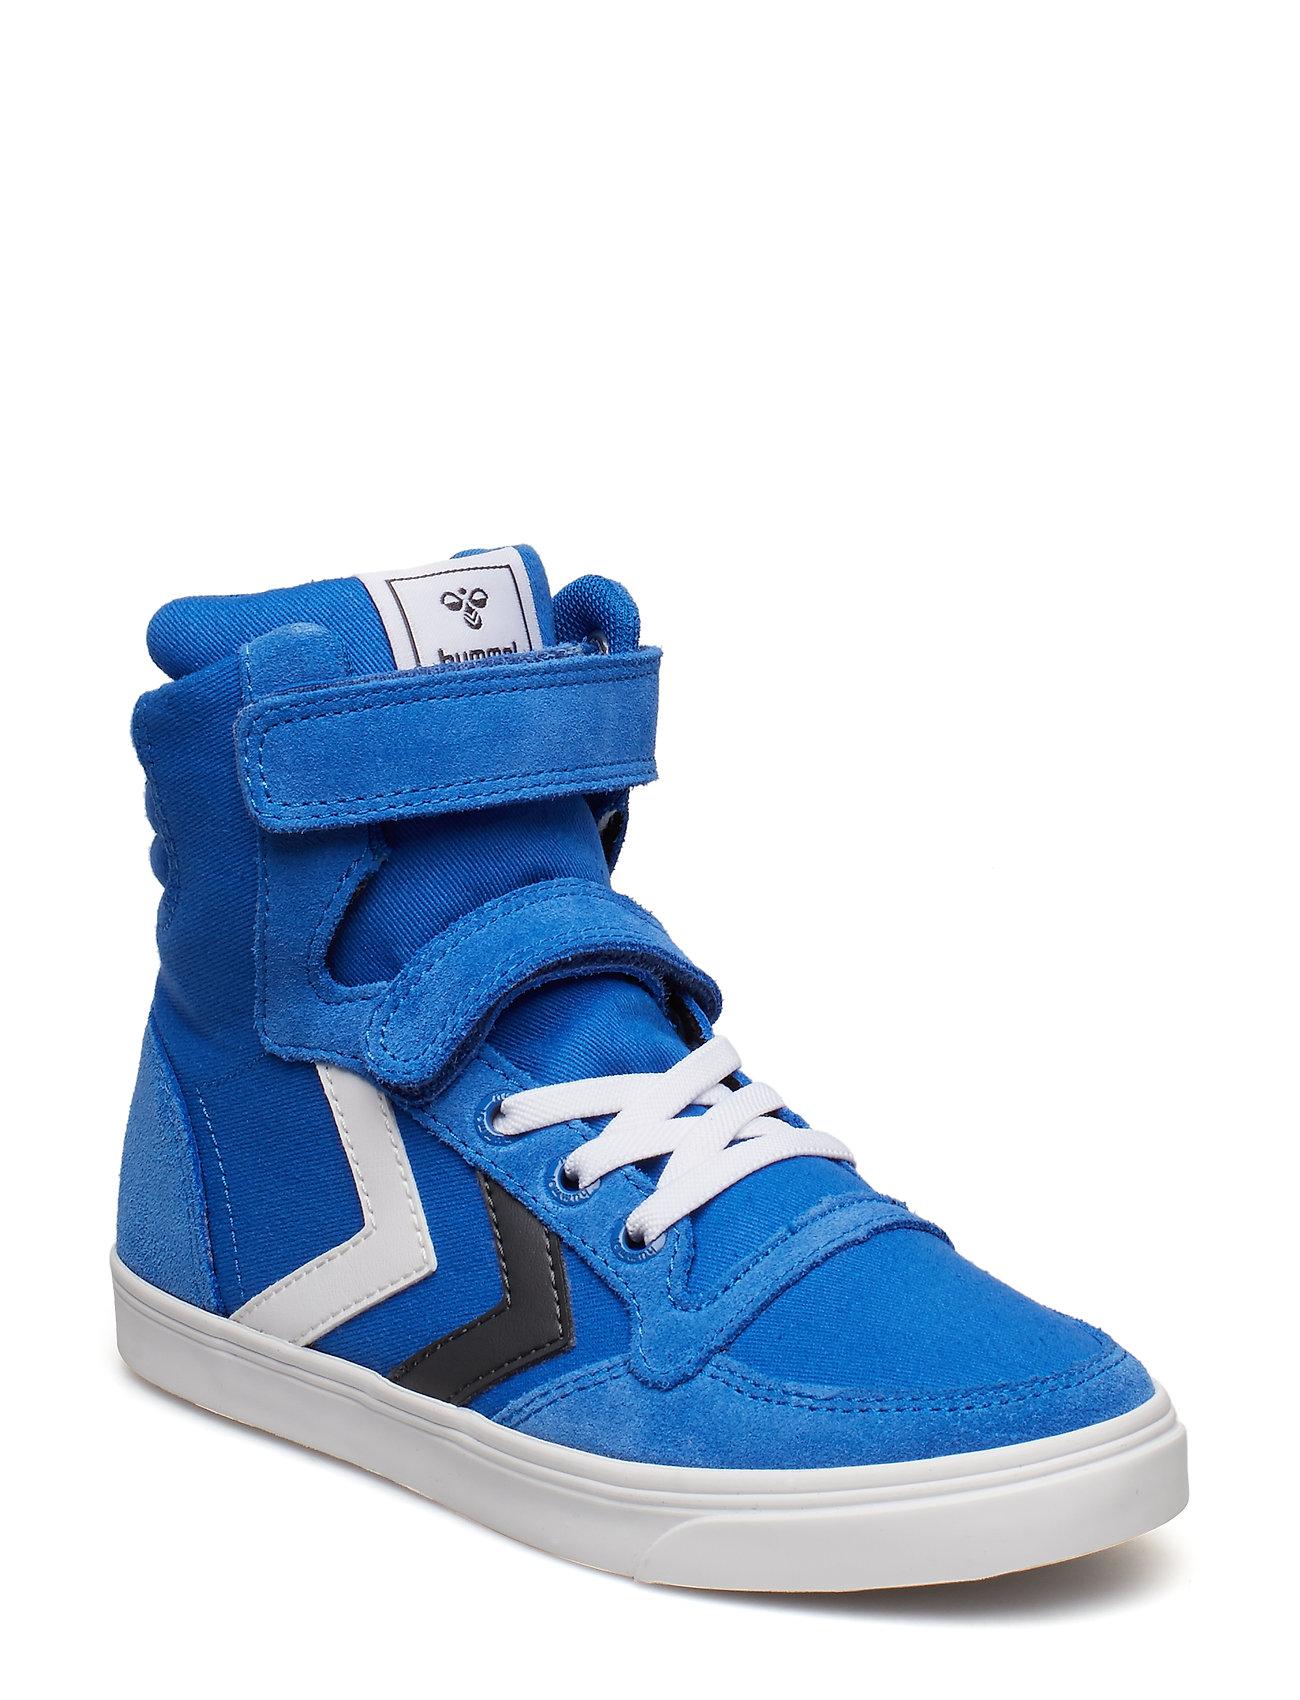 1f7078c215c Slimmer Stadil High Jr Sneakers Sko Blå HUMMEL